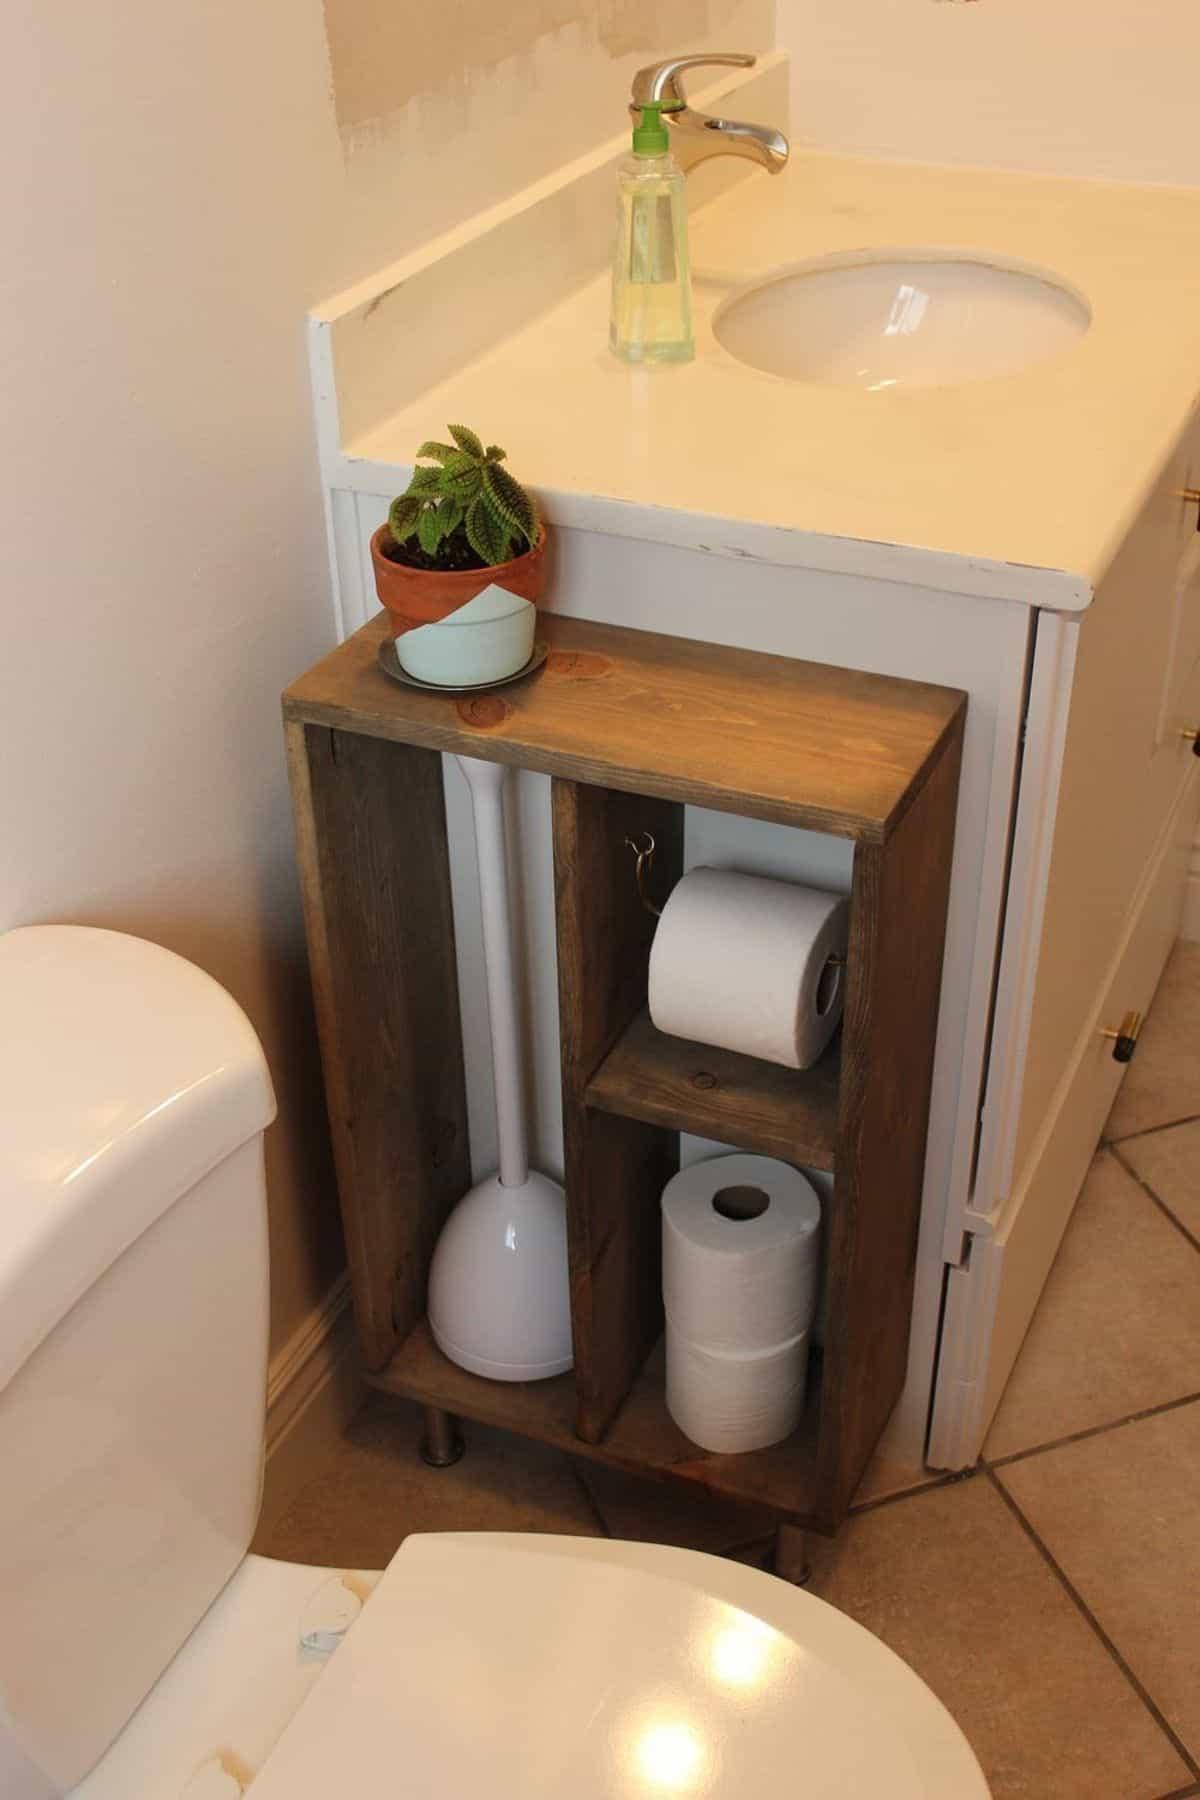 Toilet Paper Storage with Plunger Shelf